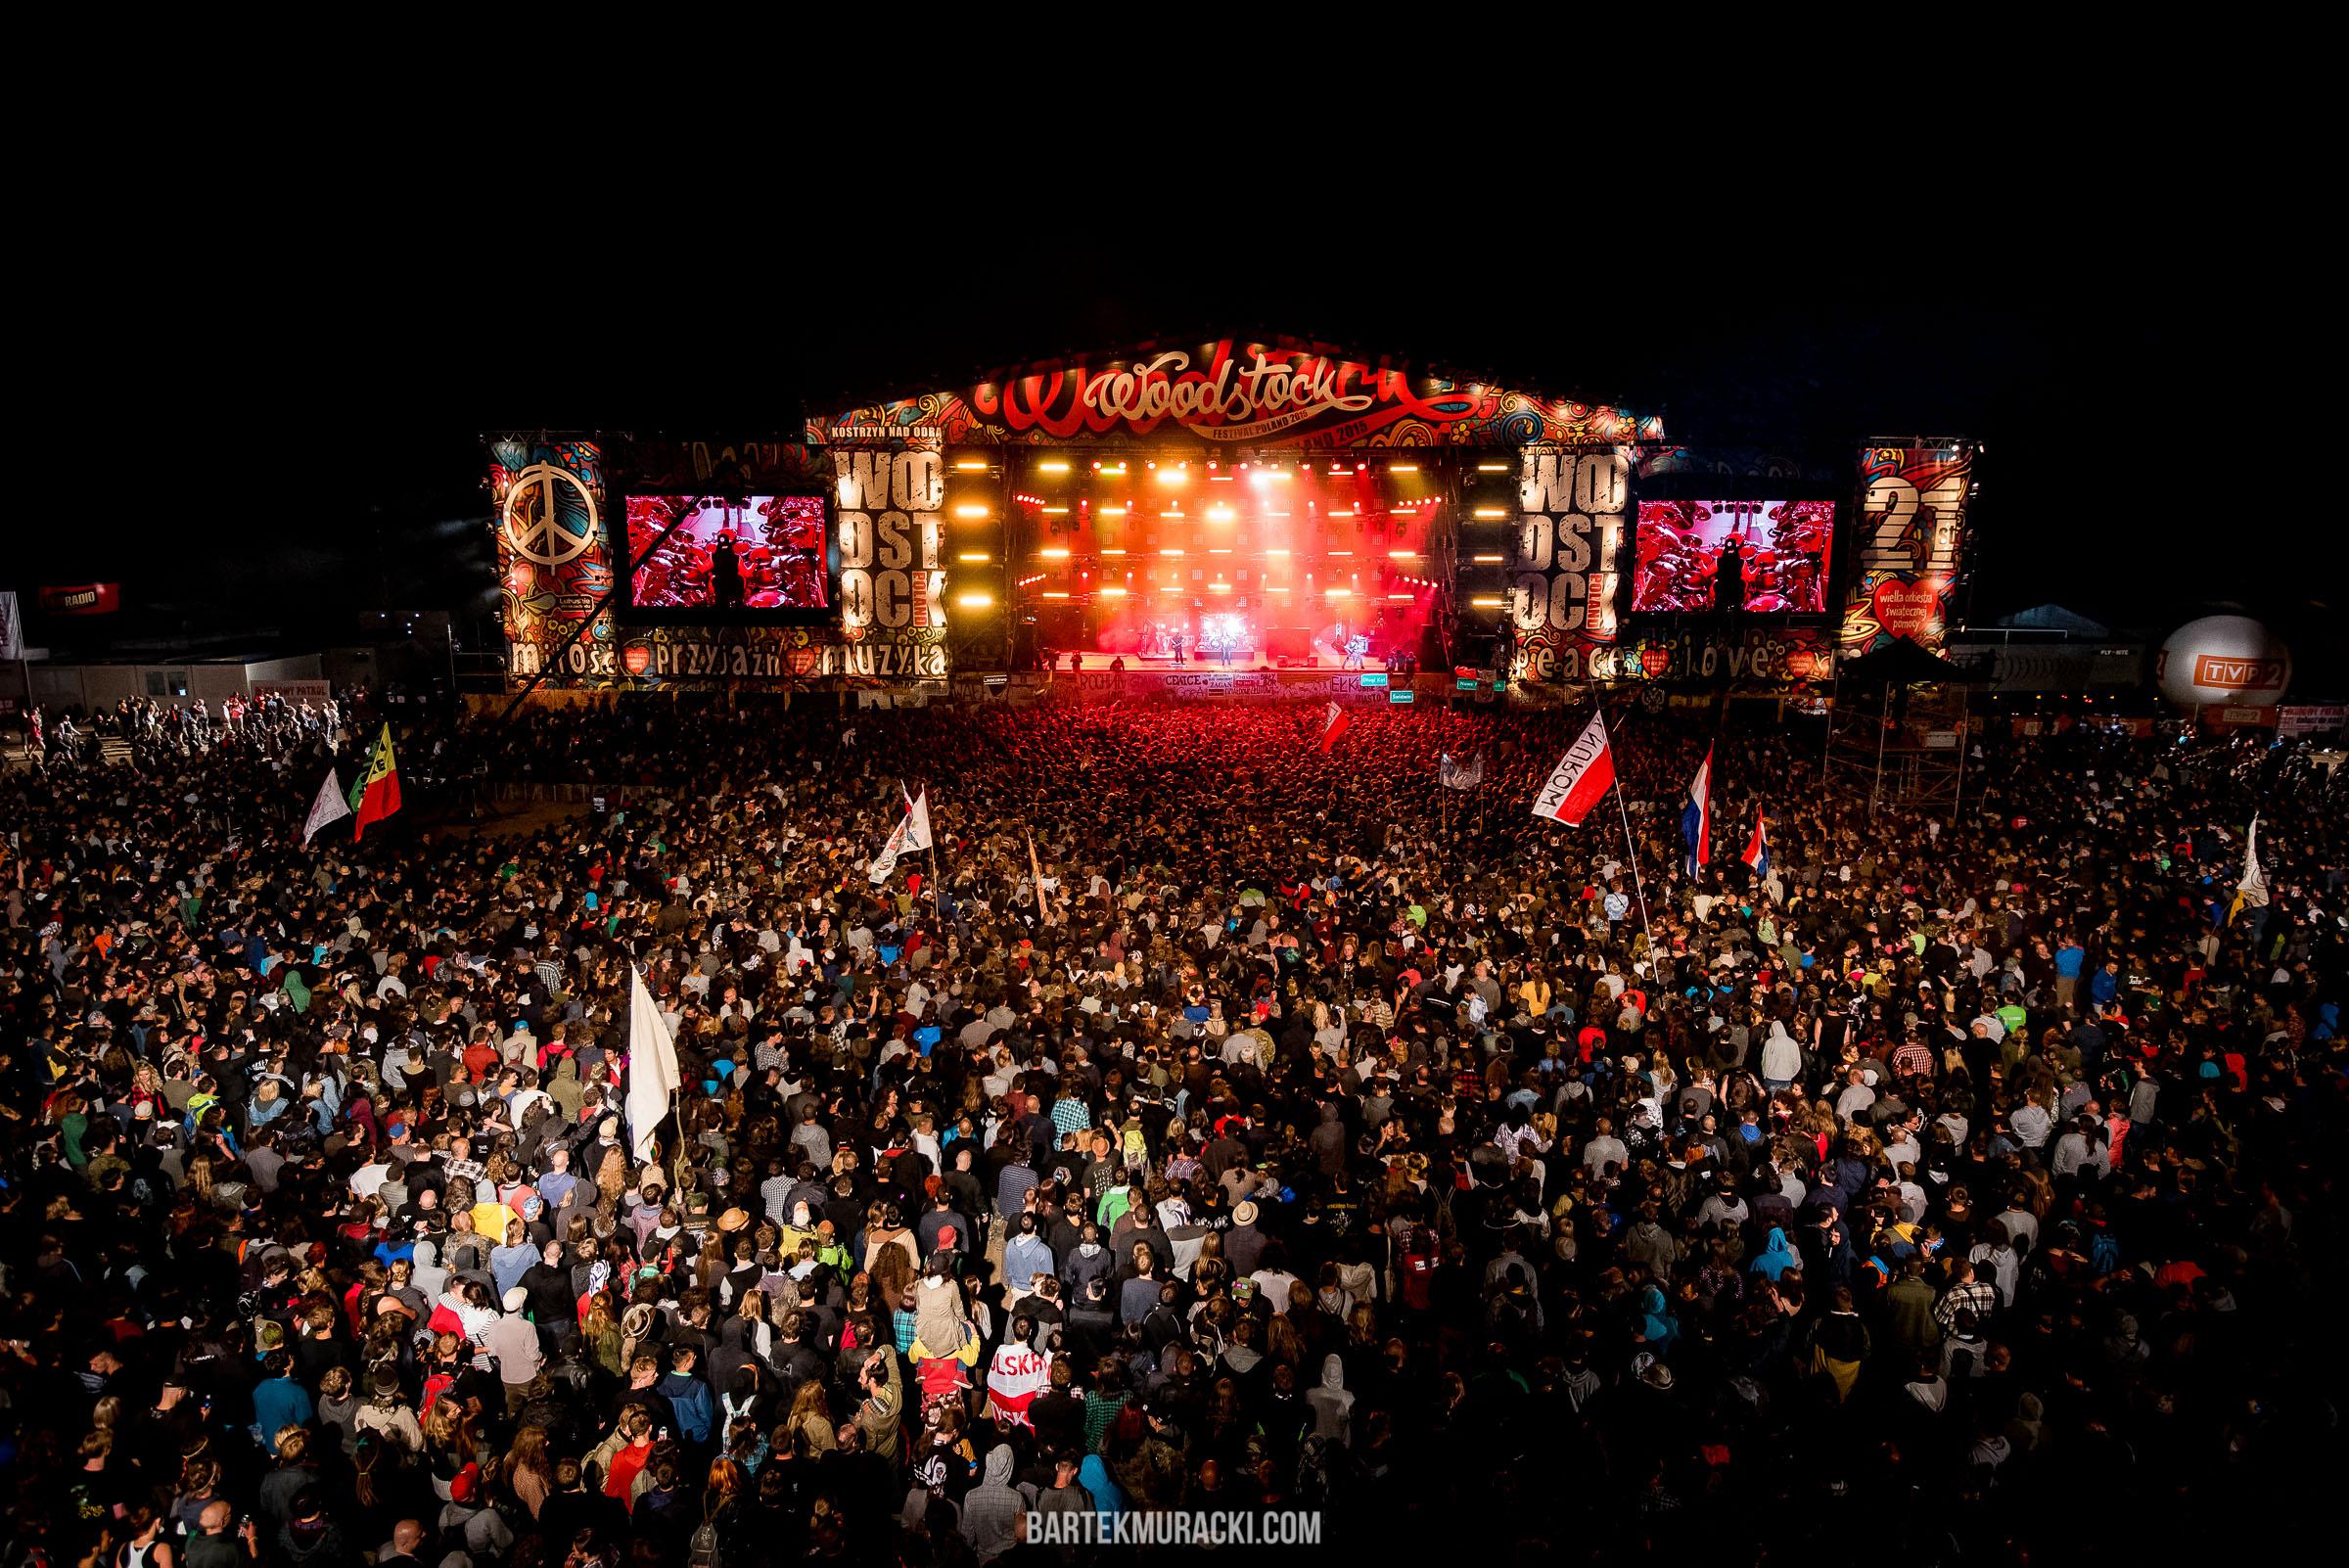 Koncerty-Przystanek-Woodstock-2015-photo-Bartek-Muracki-2627